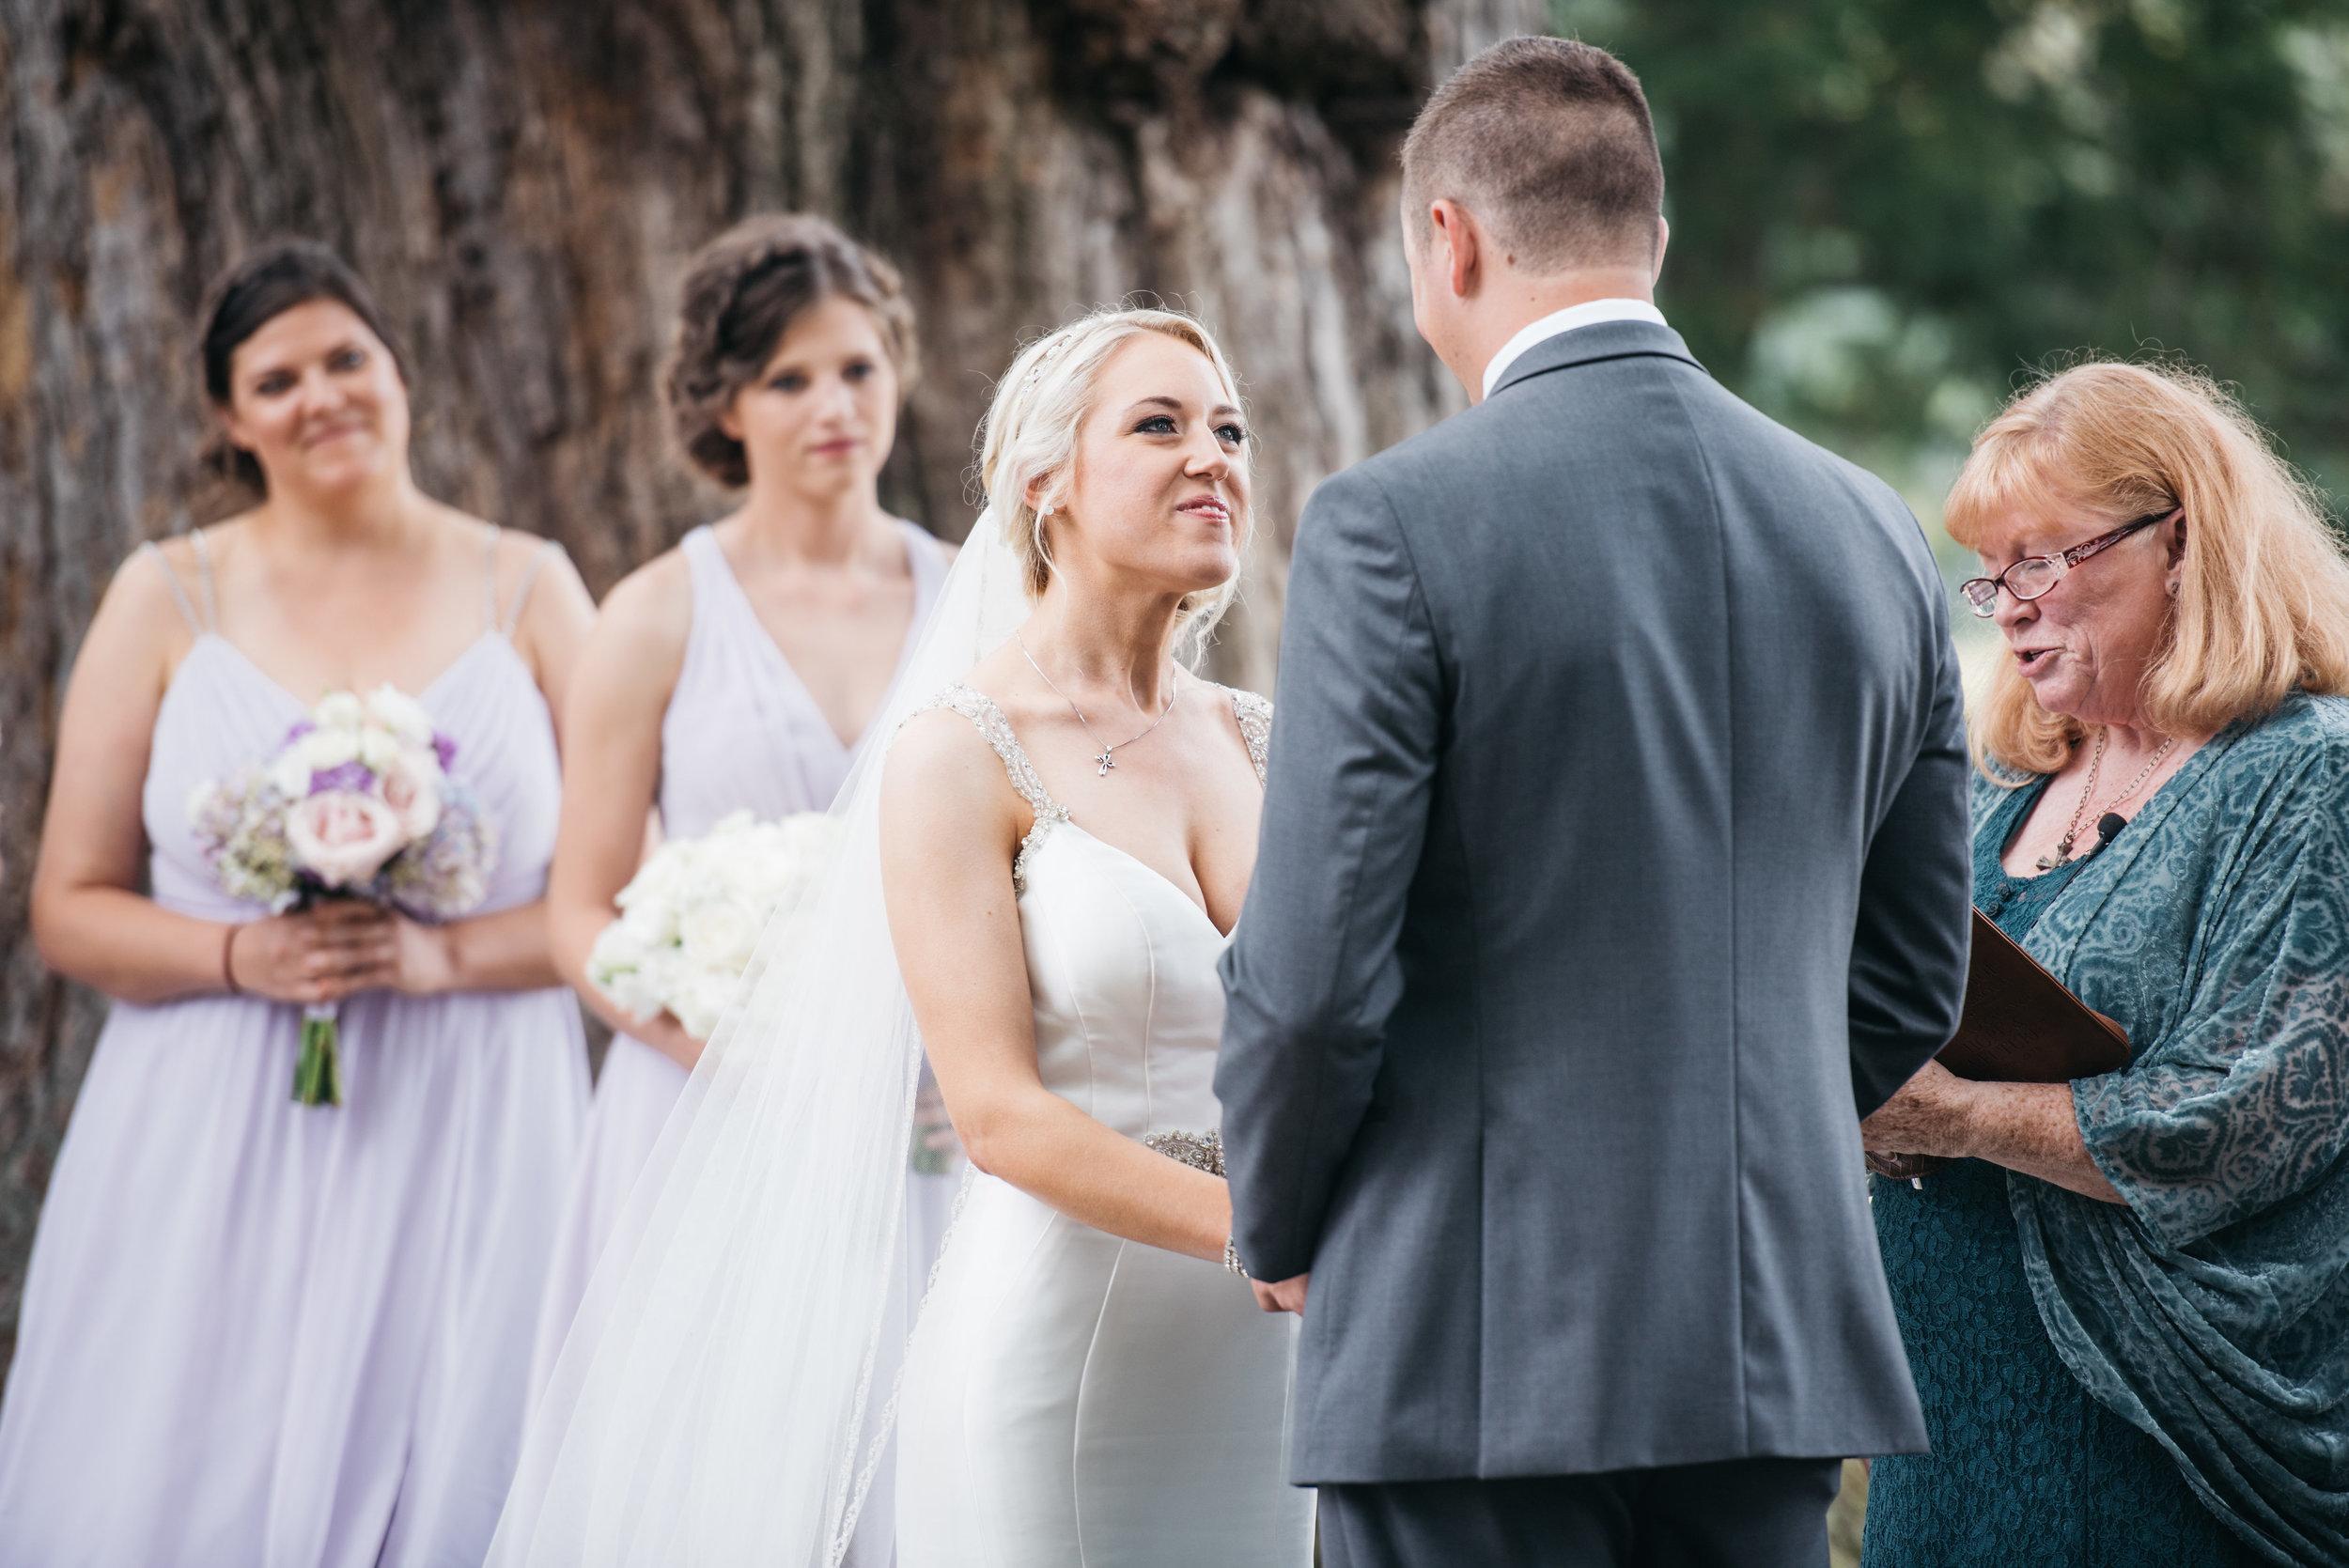 Ceremony-121.jpg